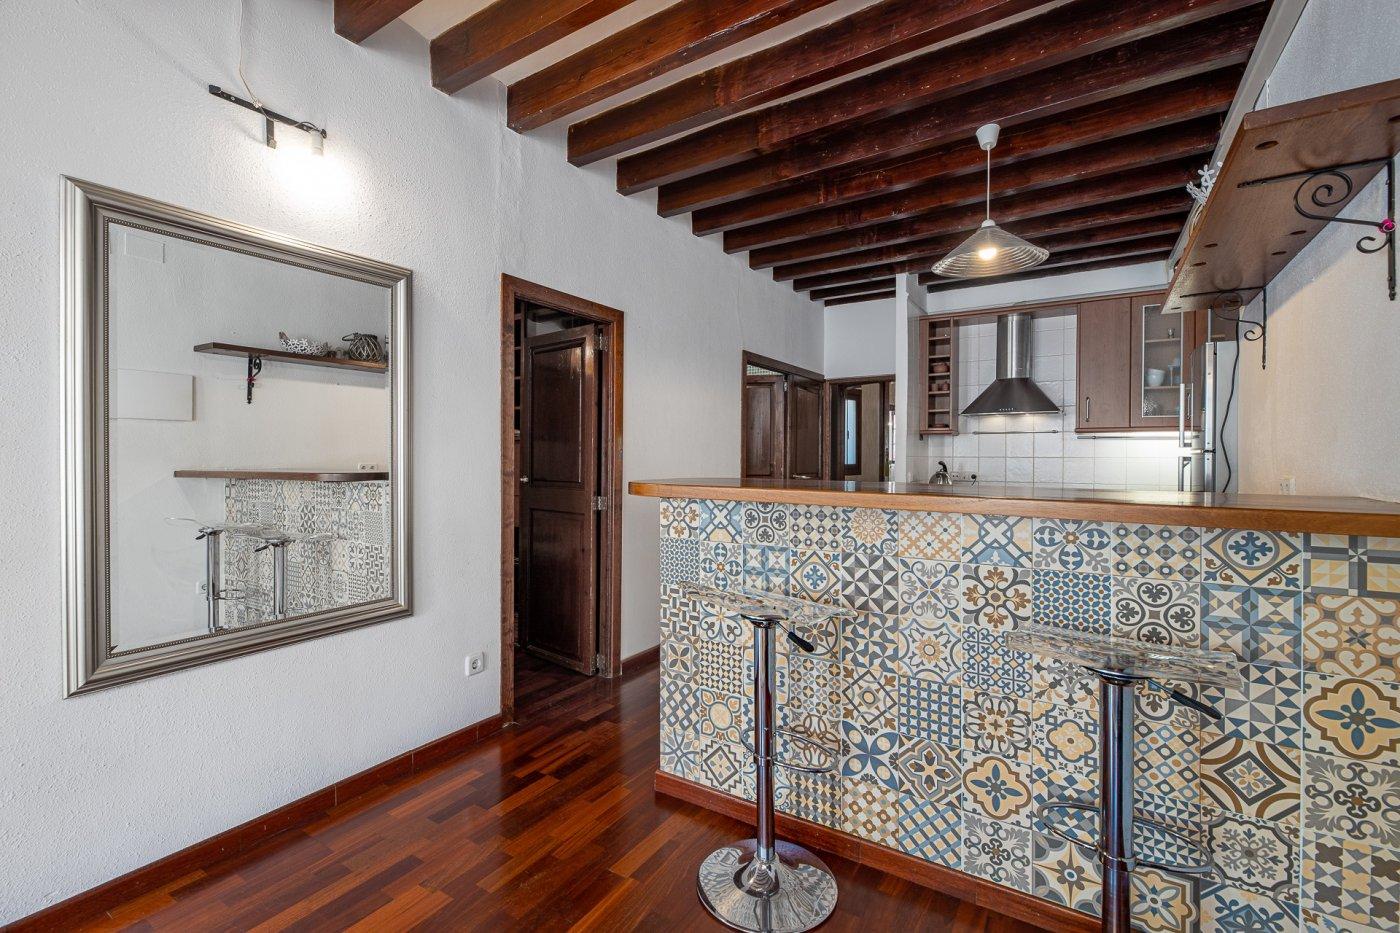 Espectacular apartamento en centro de palma - imagenInmueble22